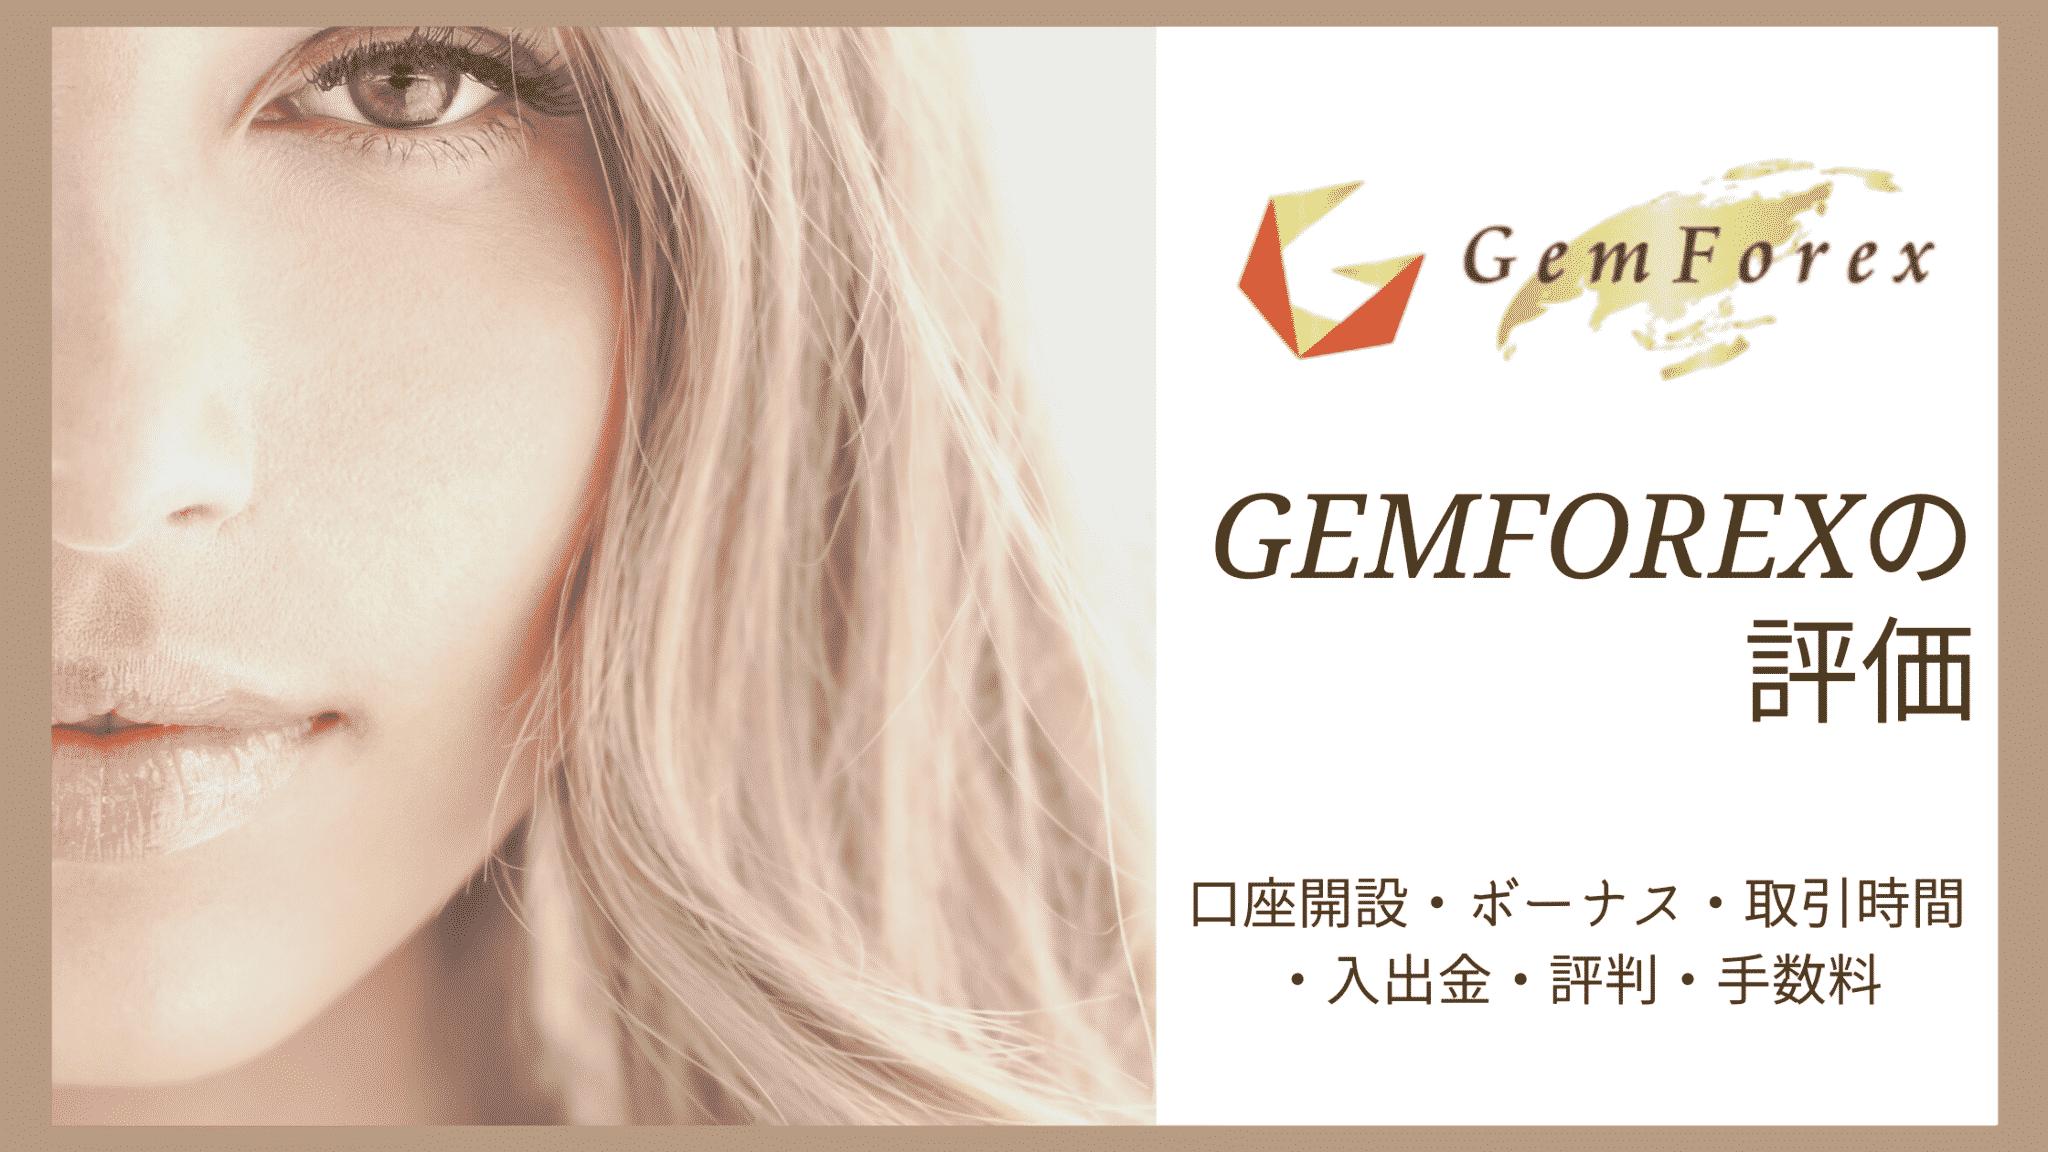 GEMFOREX|口座開設・ボーナス・取引時間・入出金・評判・手数料